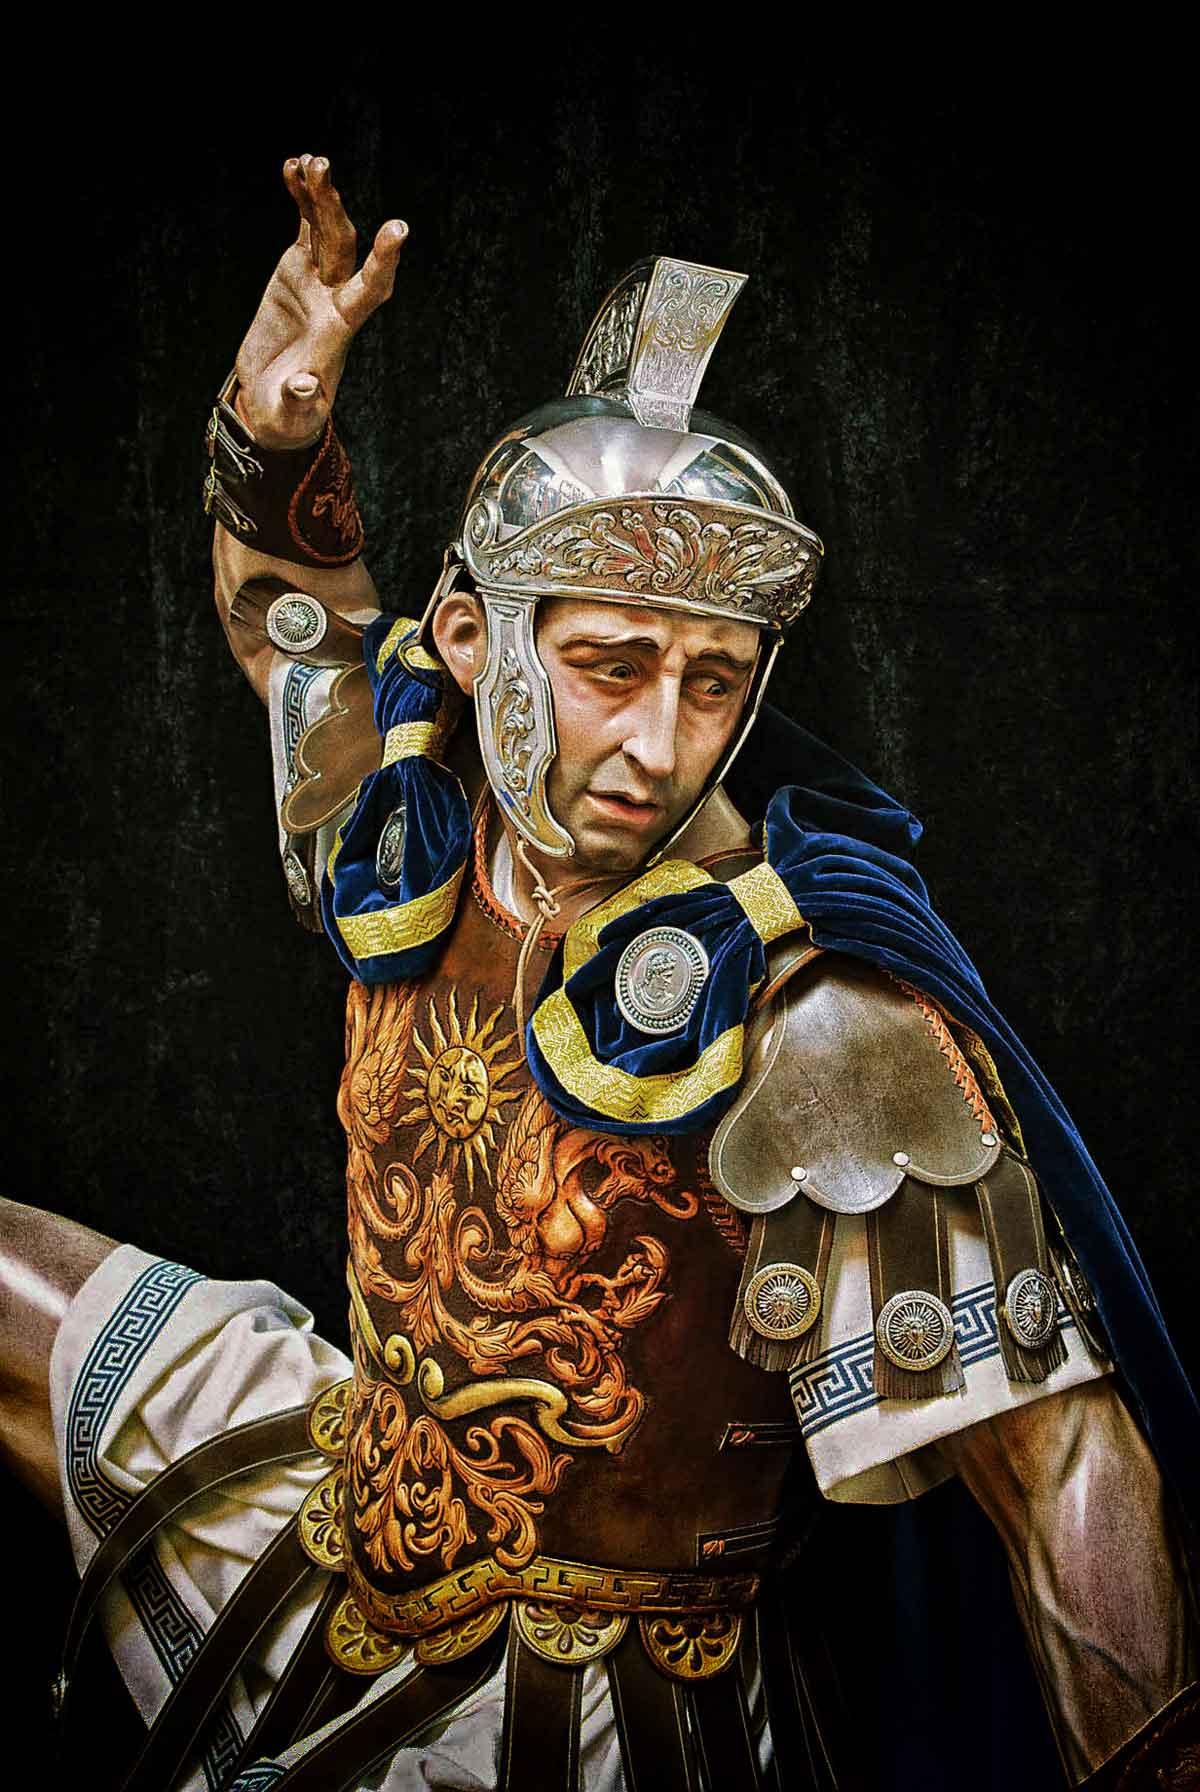 soldado-romano-resucitado-de-la-laguna-tenerife-1